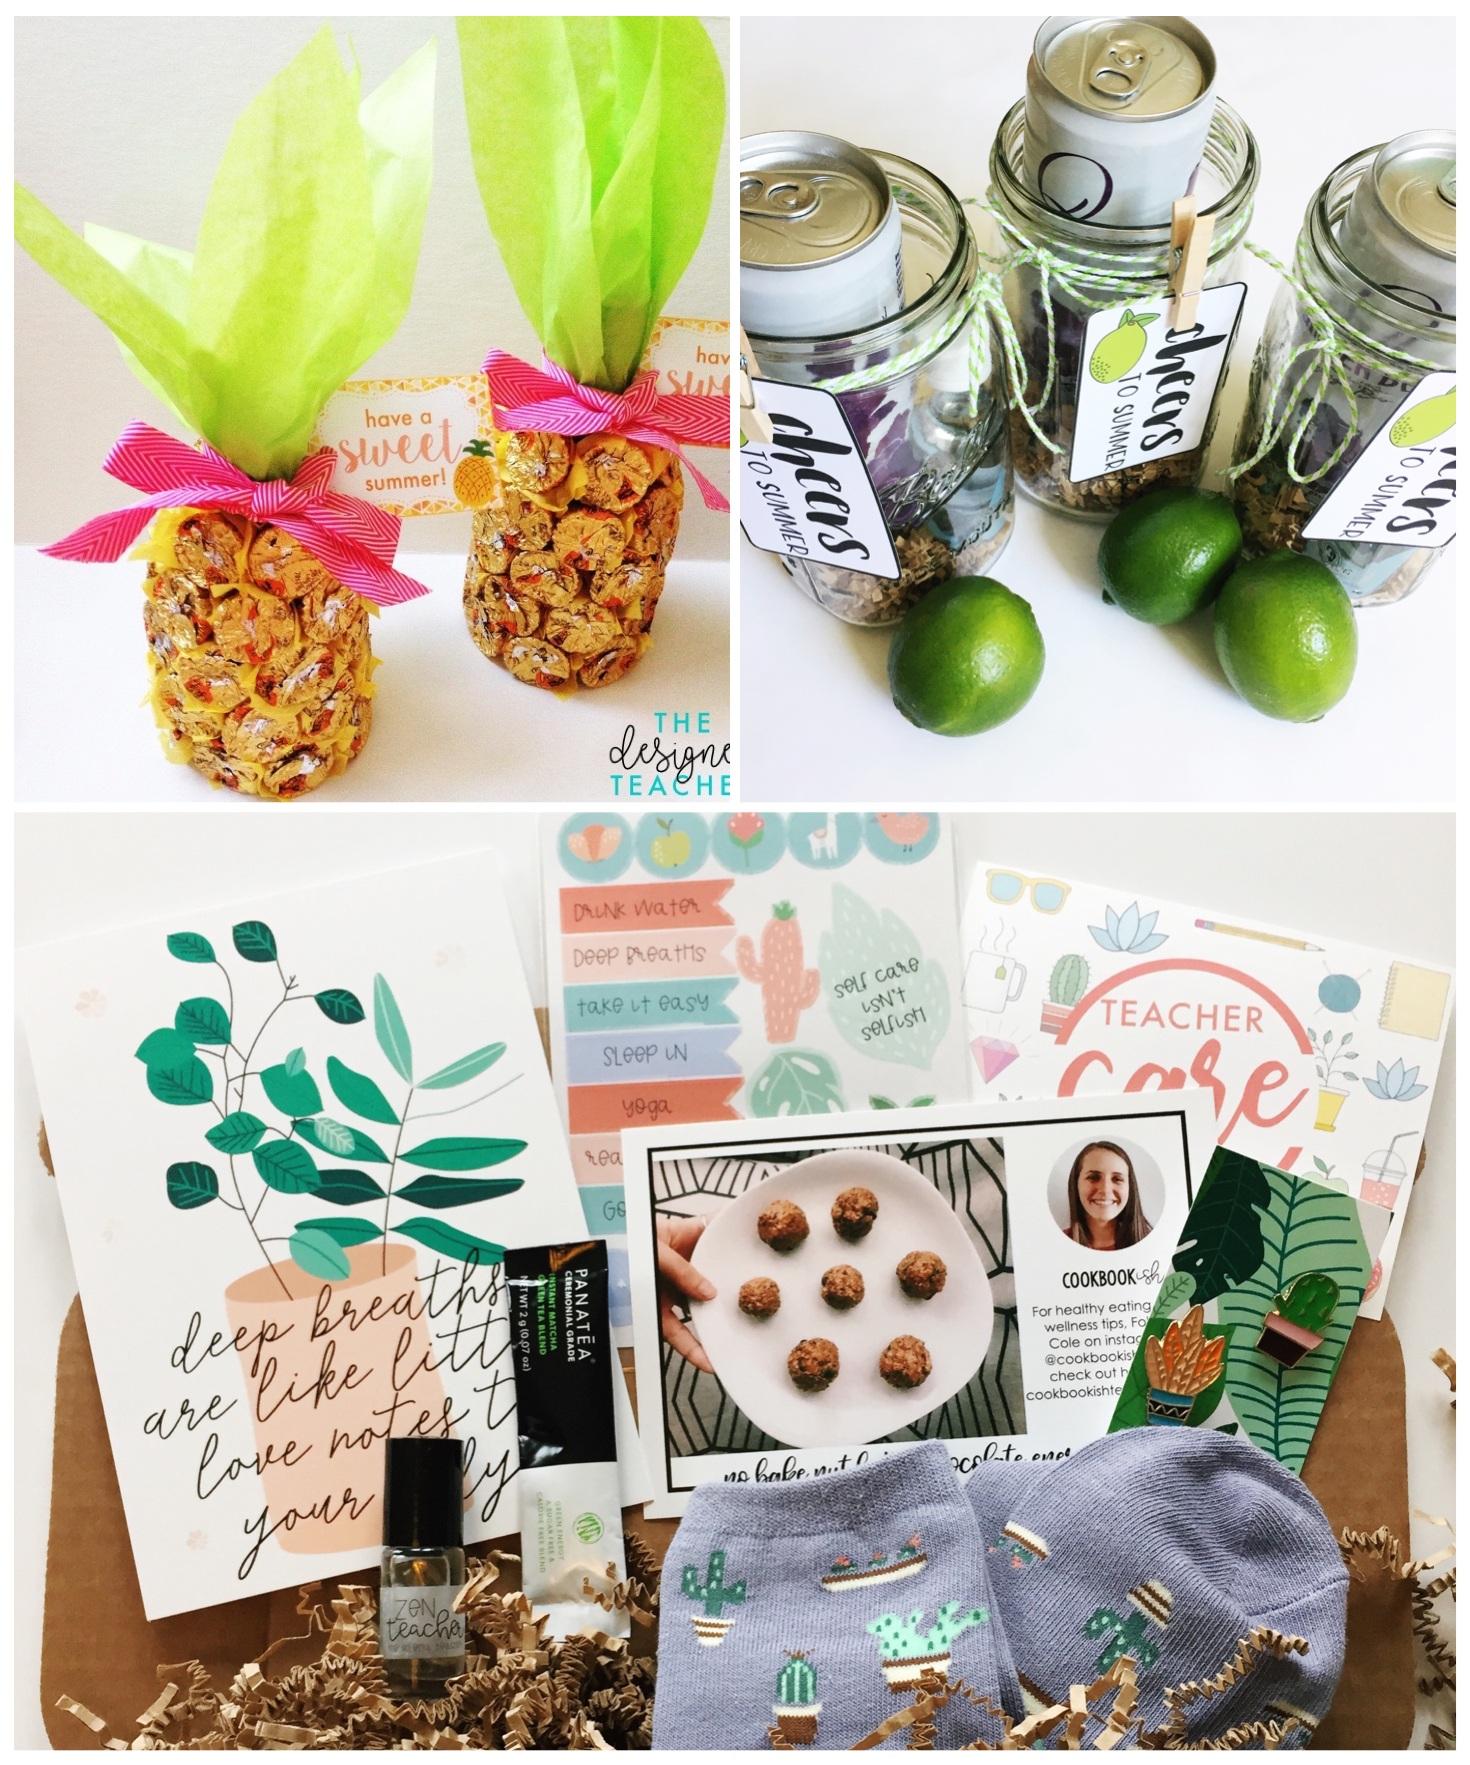 3 Super Cute End Of The Year Teacher Gifts The Designer Teacher